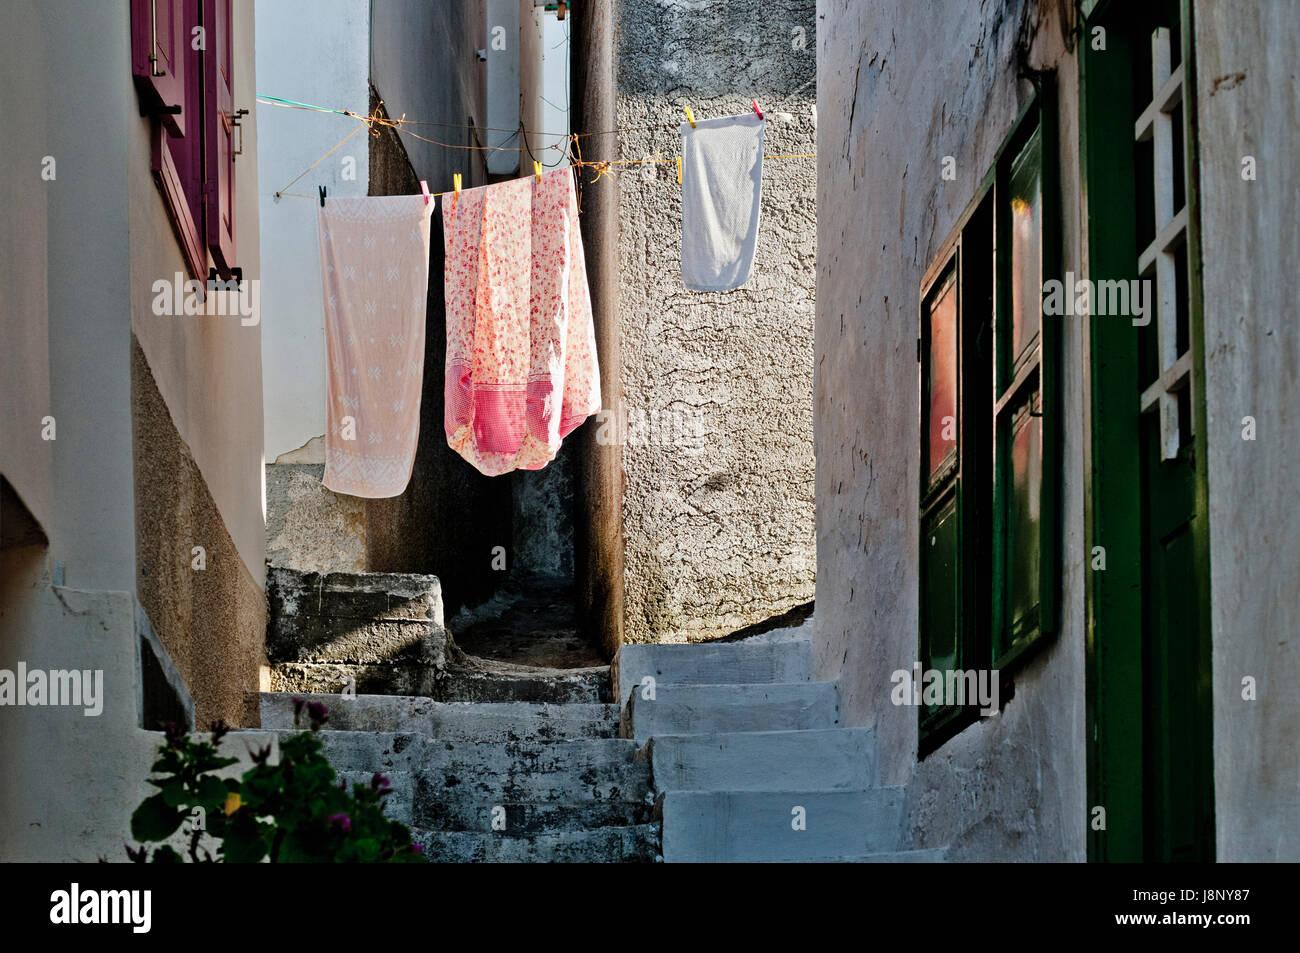 Clothesline in narrow street Stock Photo